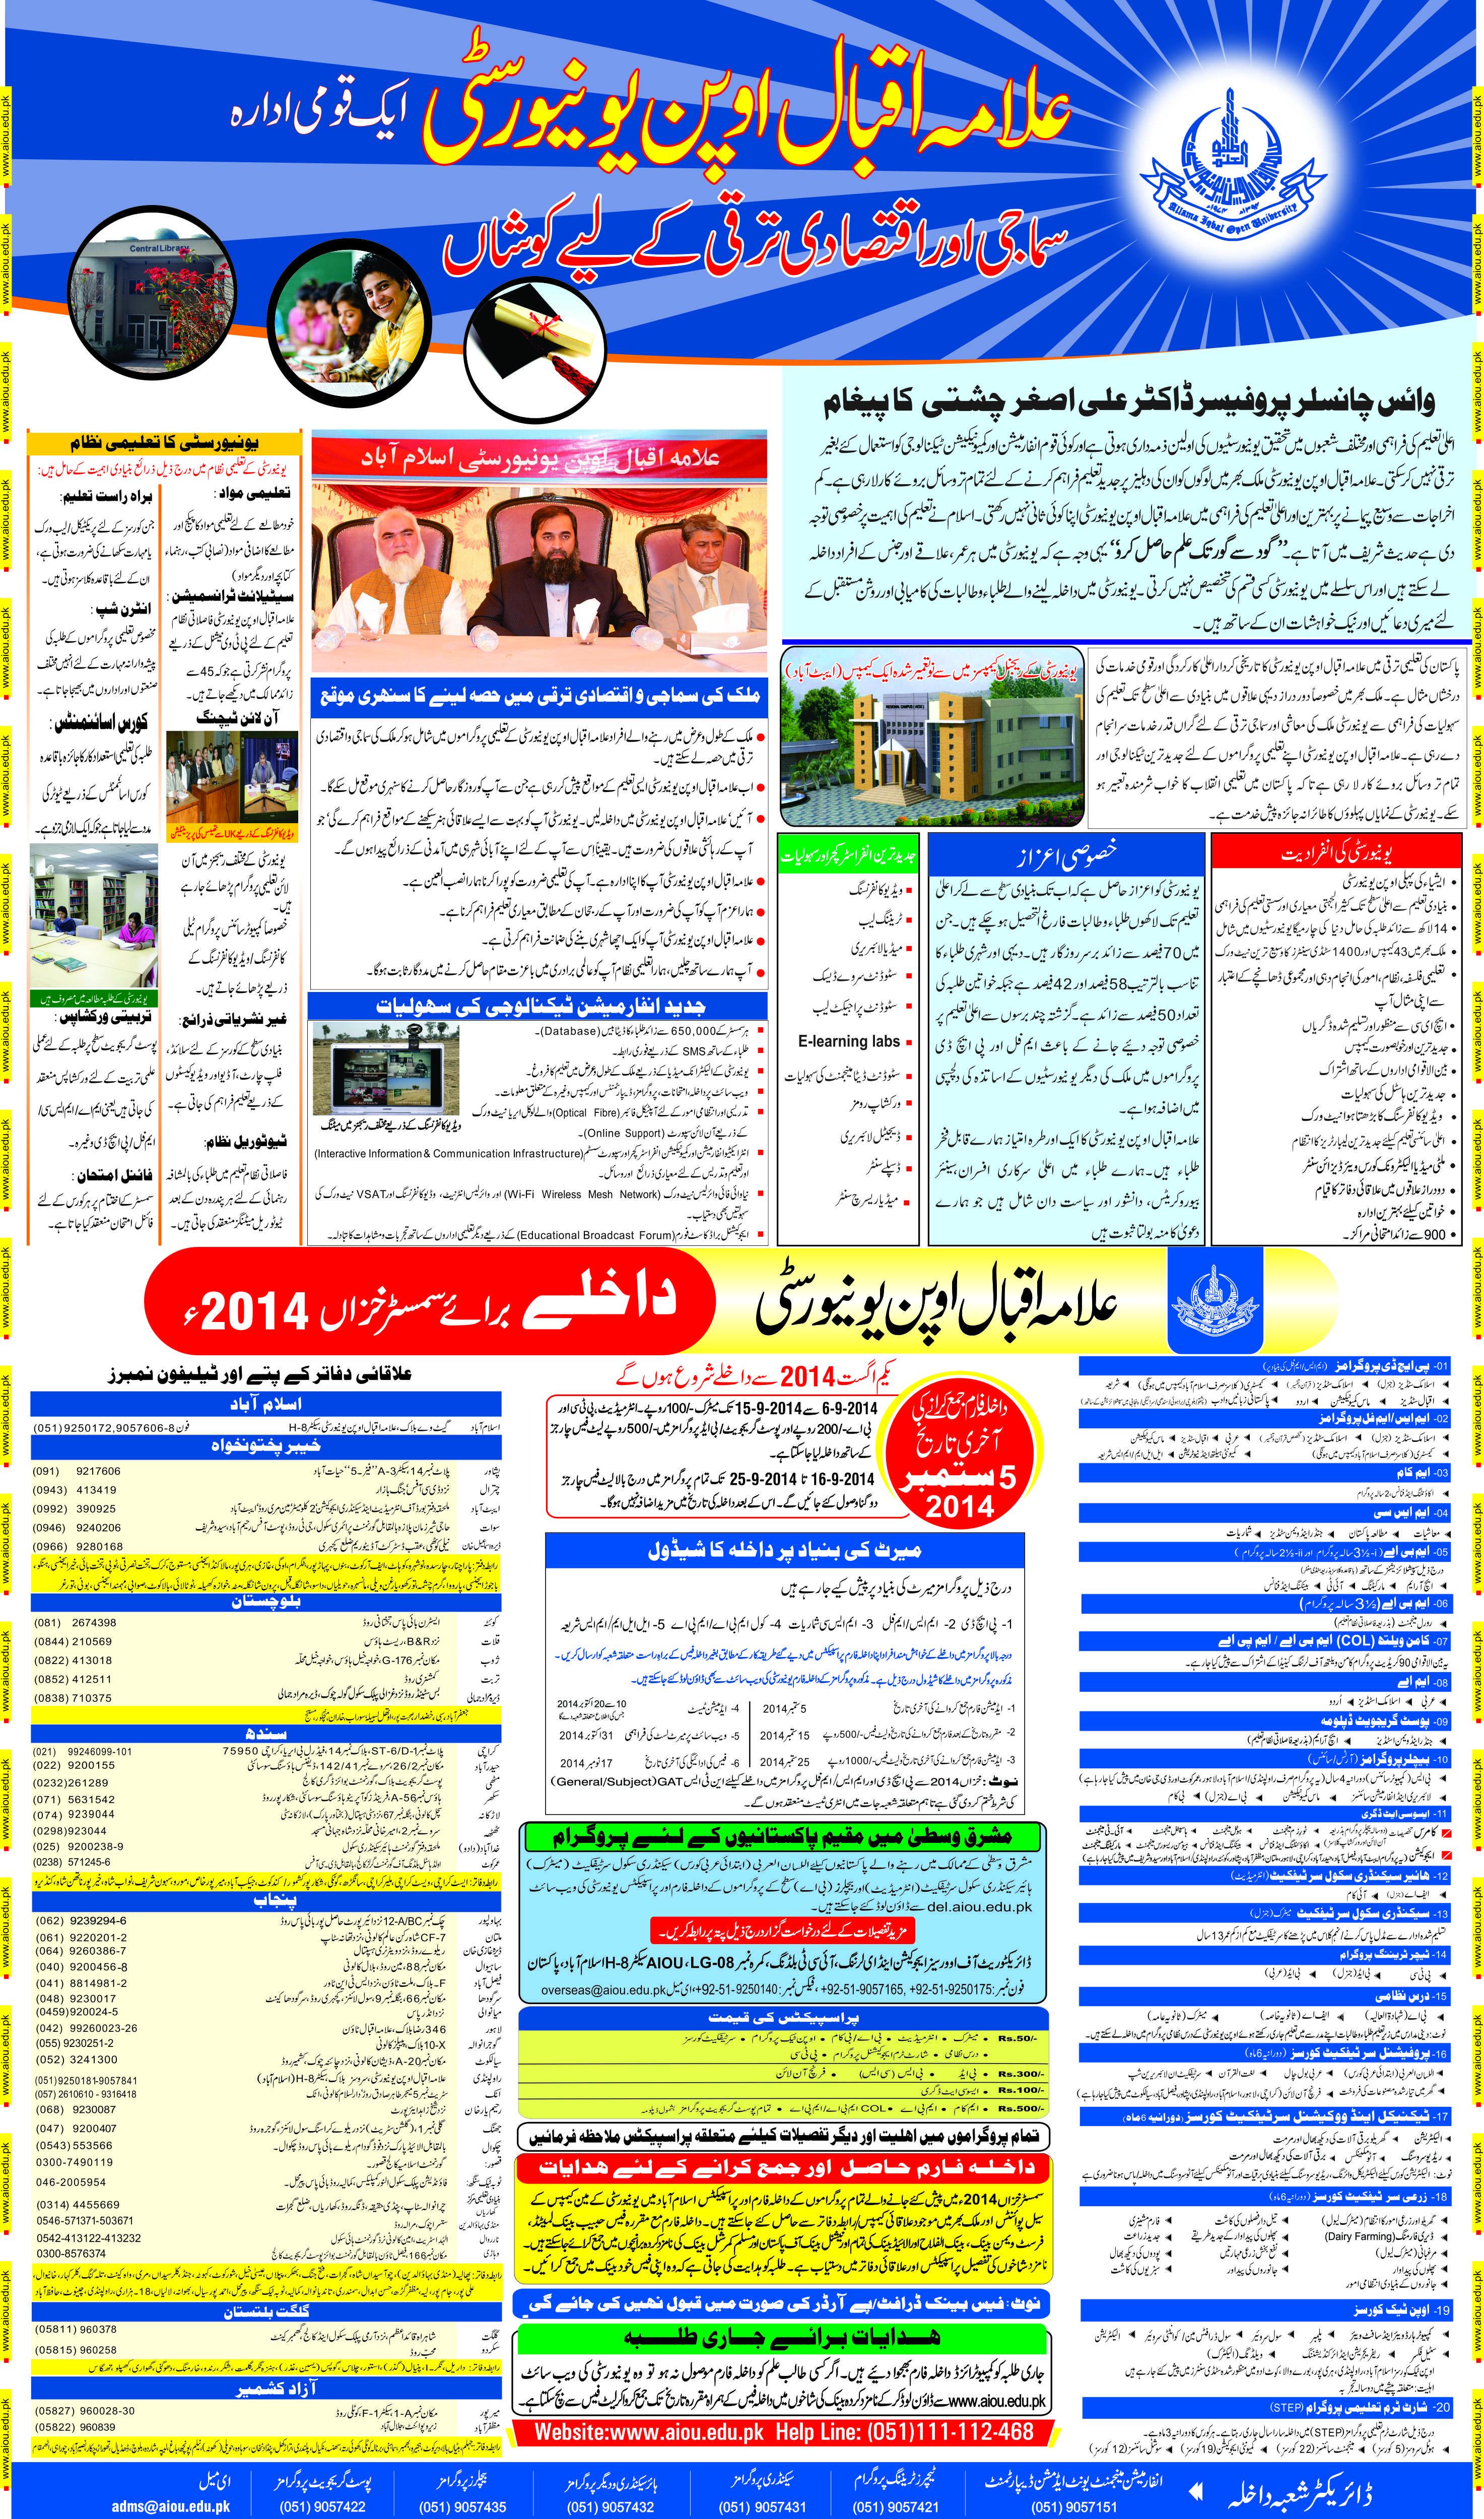 AIOU Allama Iqbal Open University Autumn Admission 2015